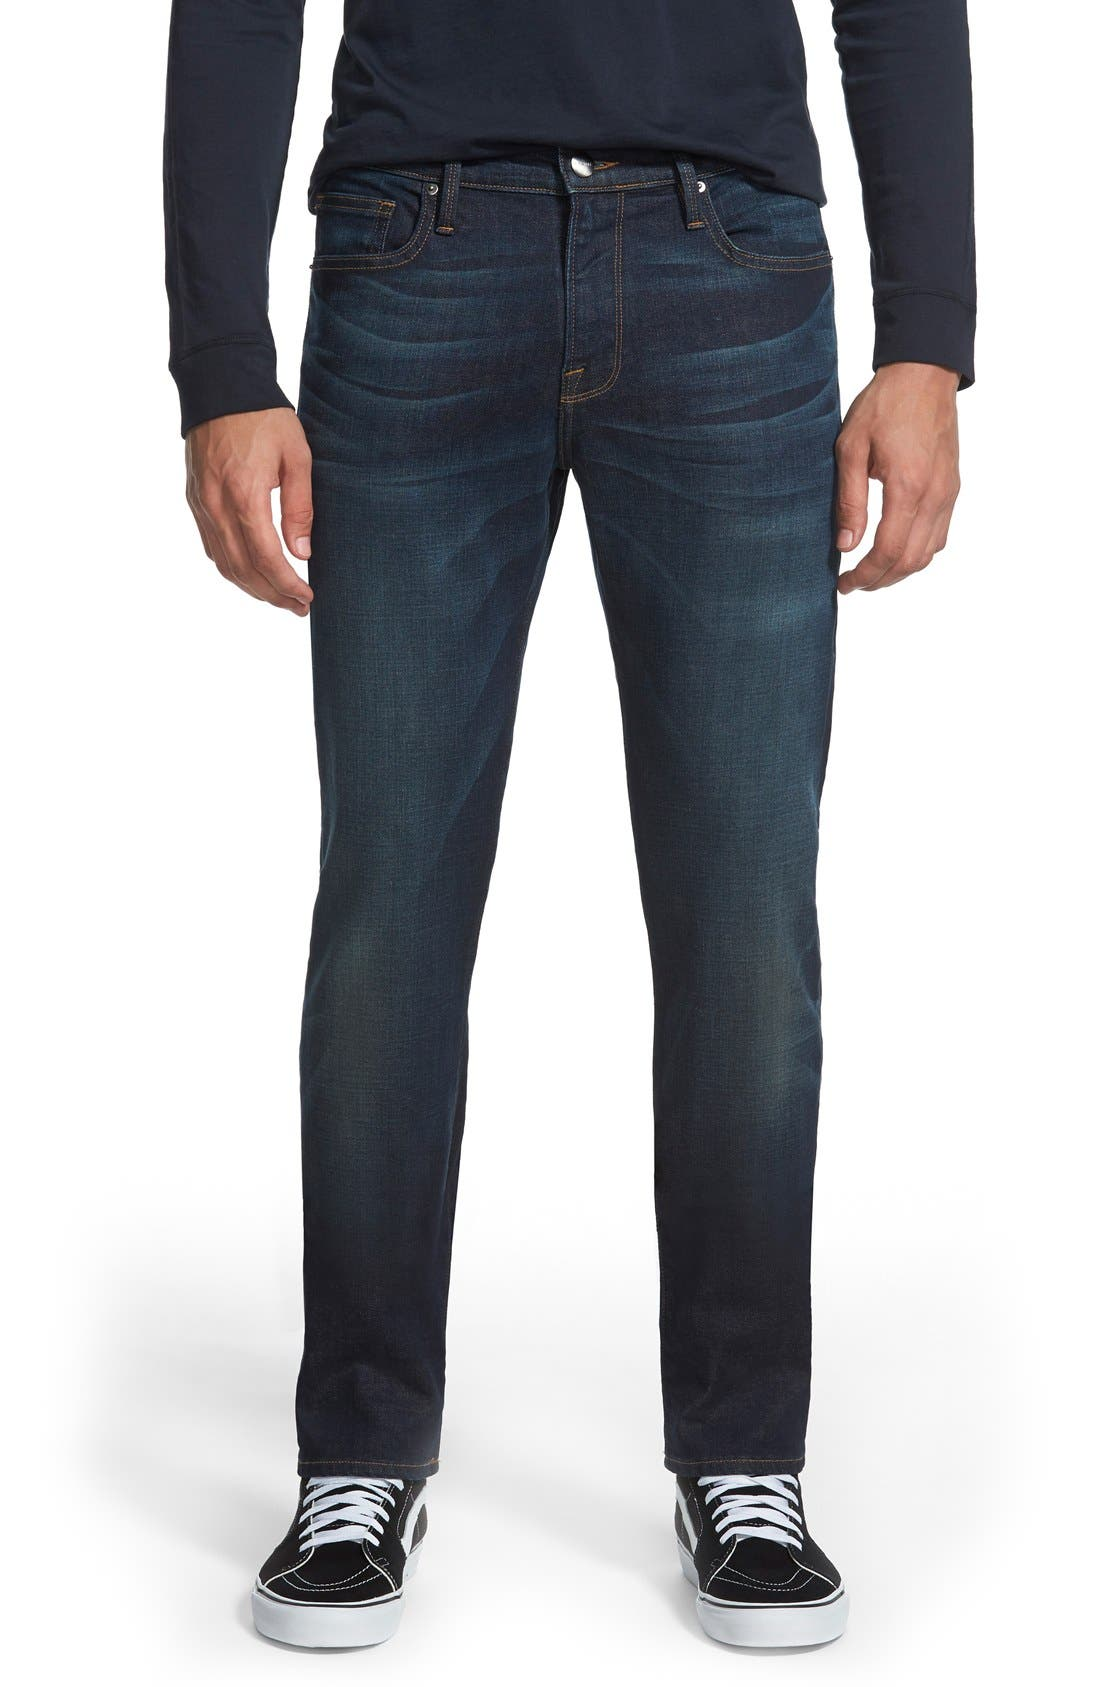 FRAME L'Homme Skinny Fit Jeans (Sierra)